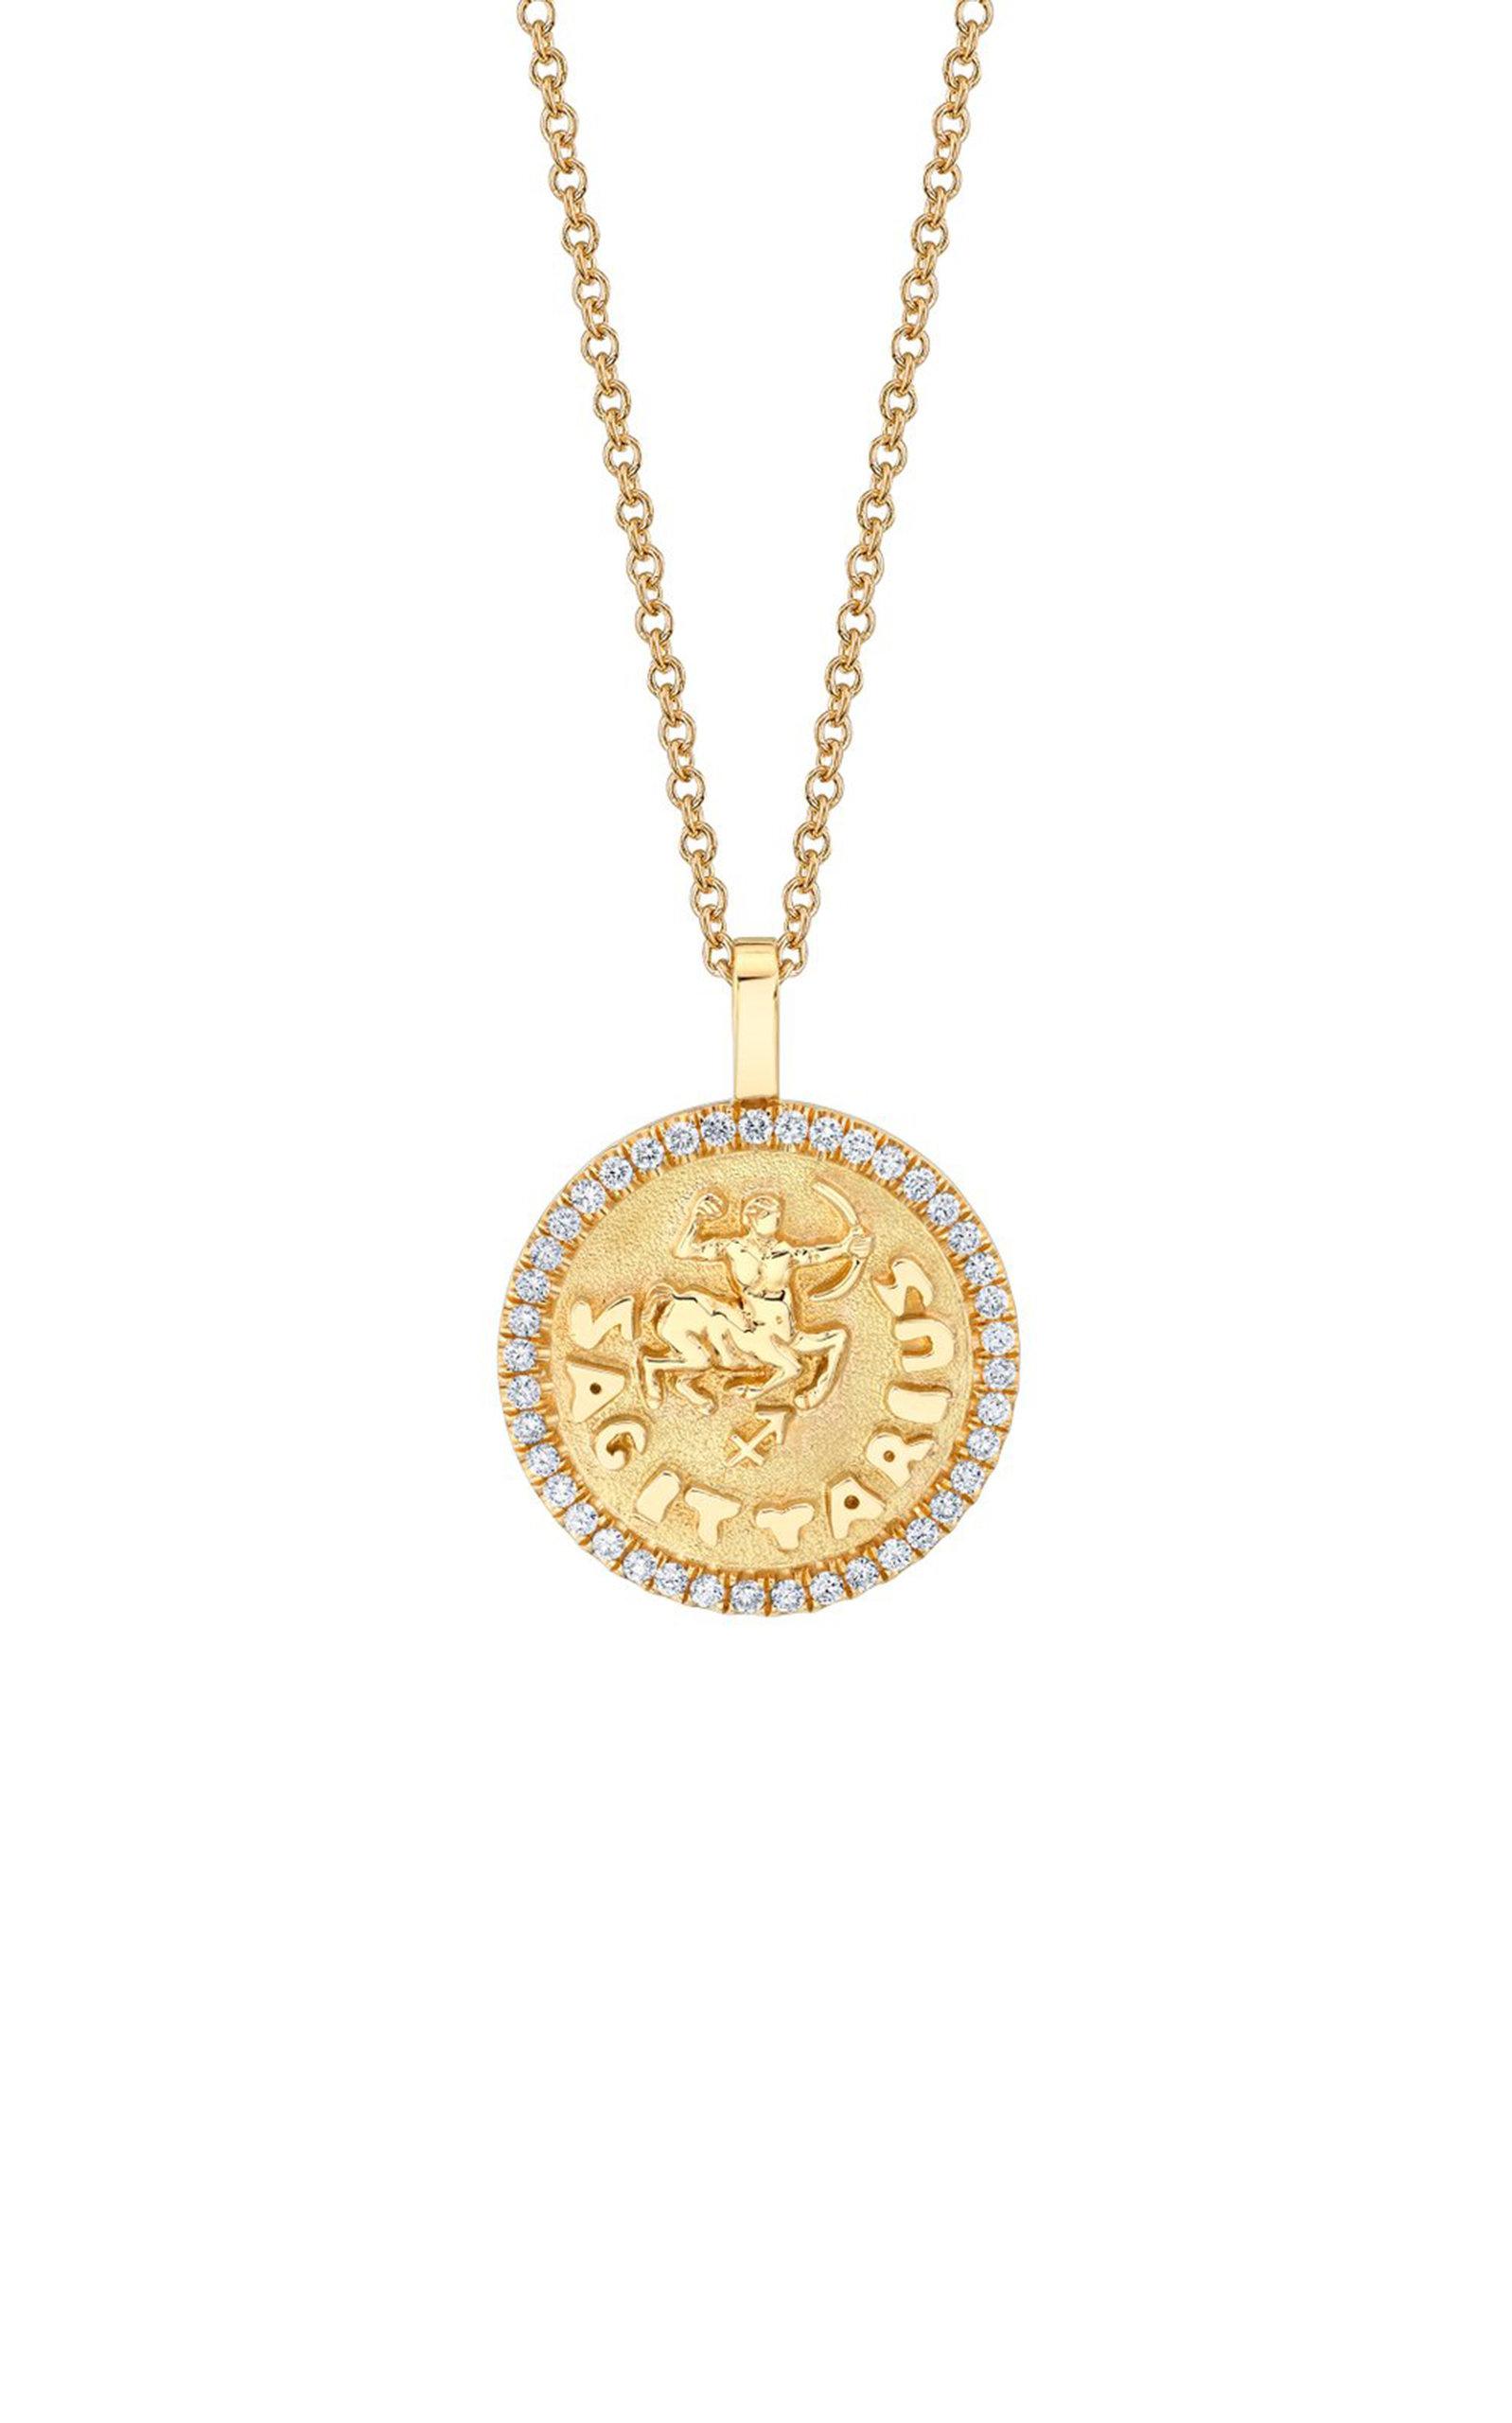 Anita Ko BESPOKE ZODIAC 18K YELLOW GOLD DIAMOND PENDANT AND ASTROLOGY READING